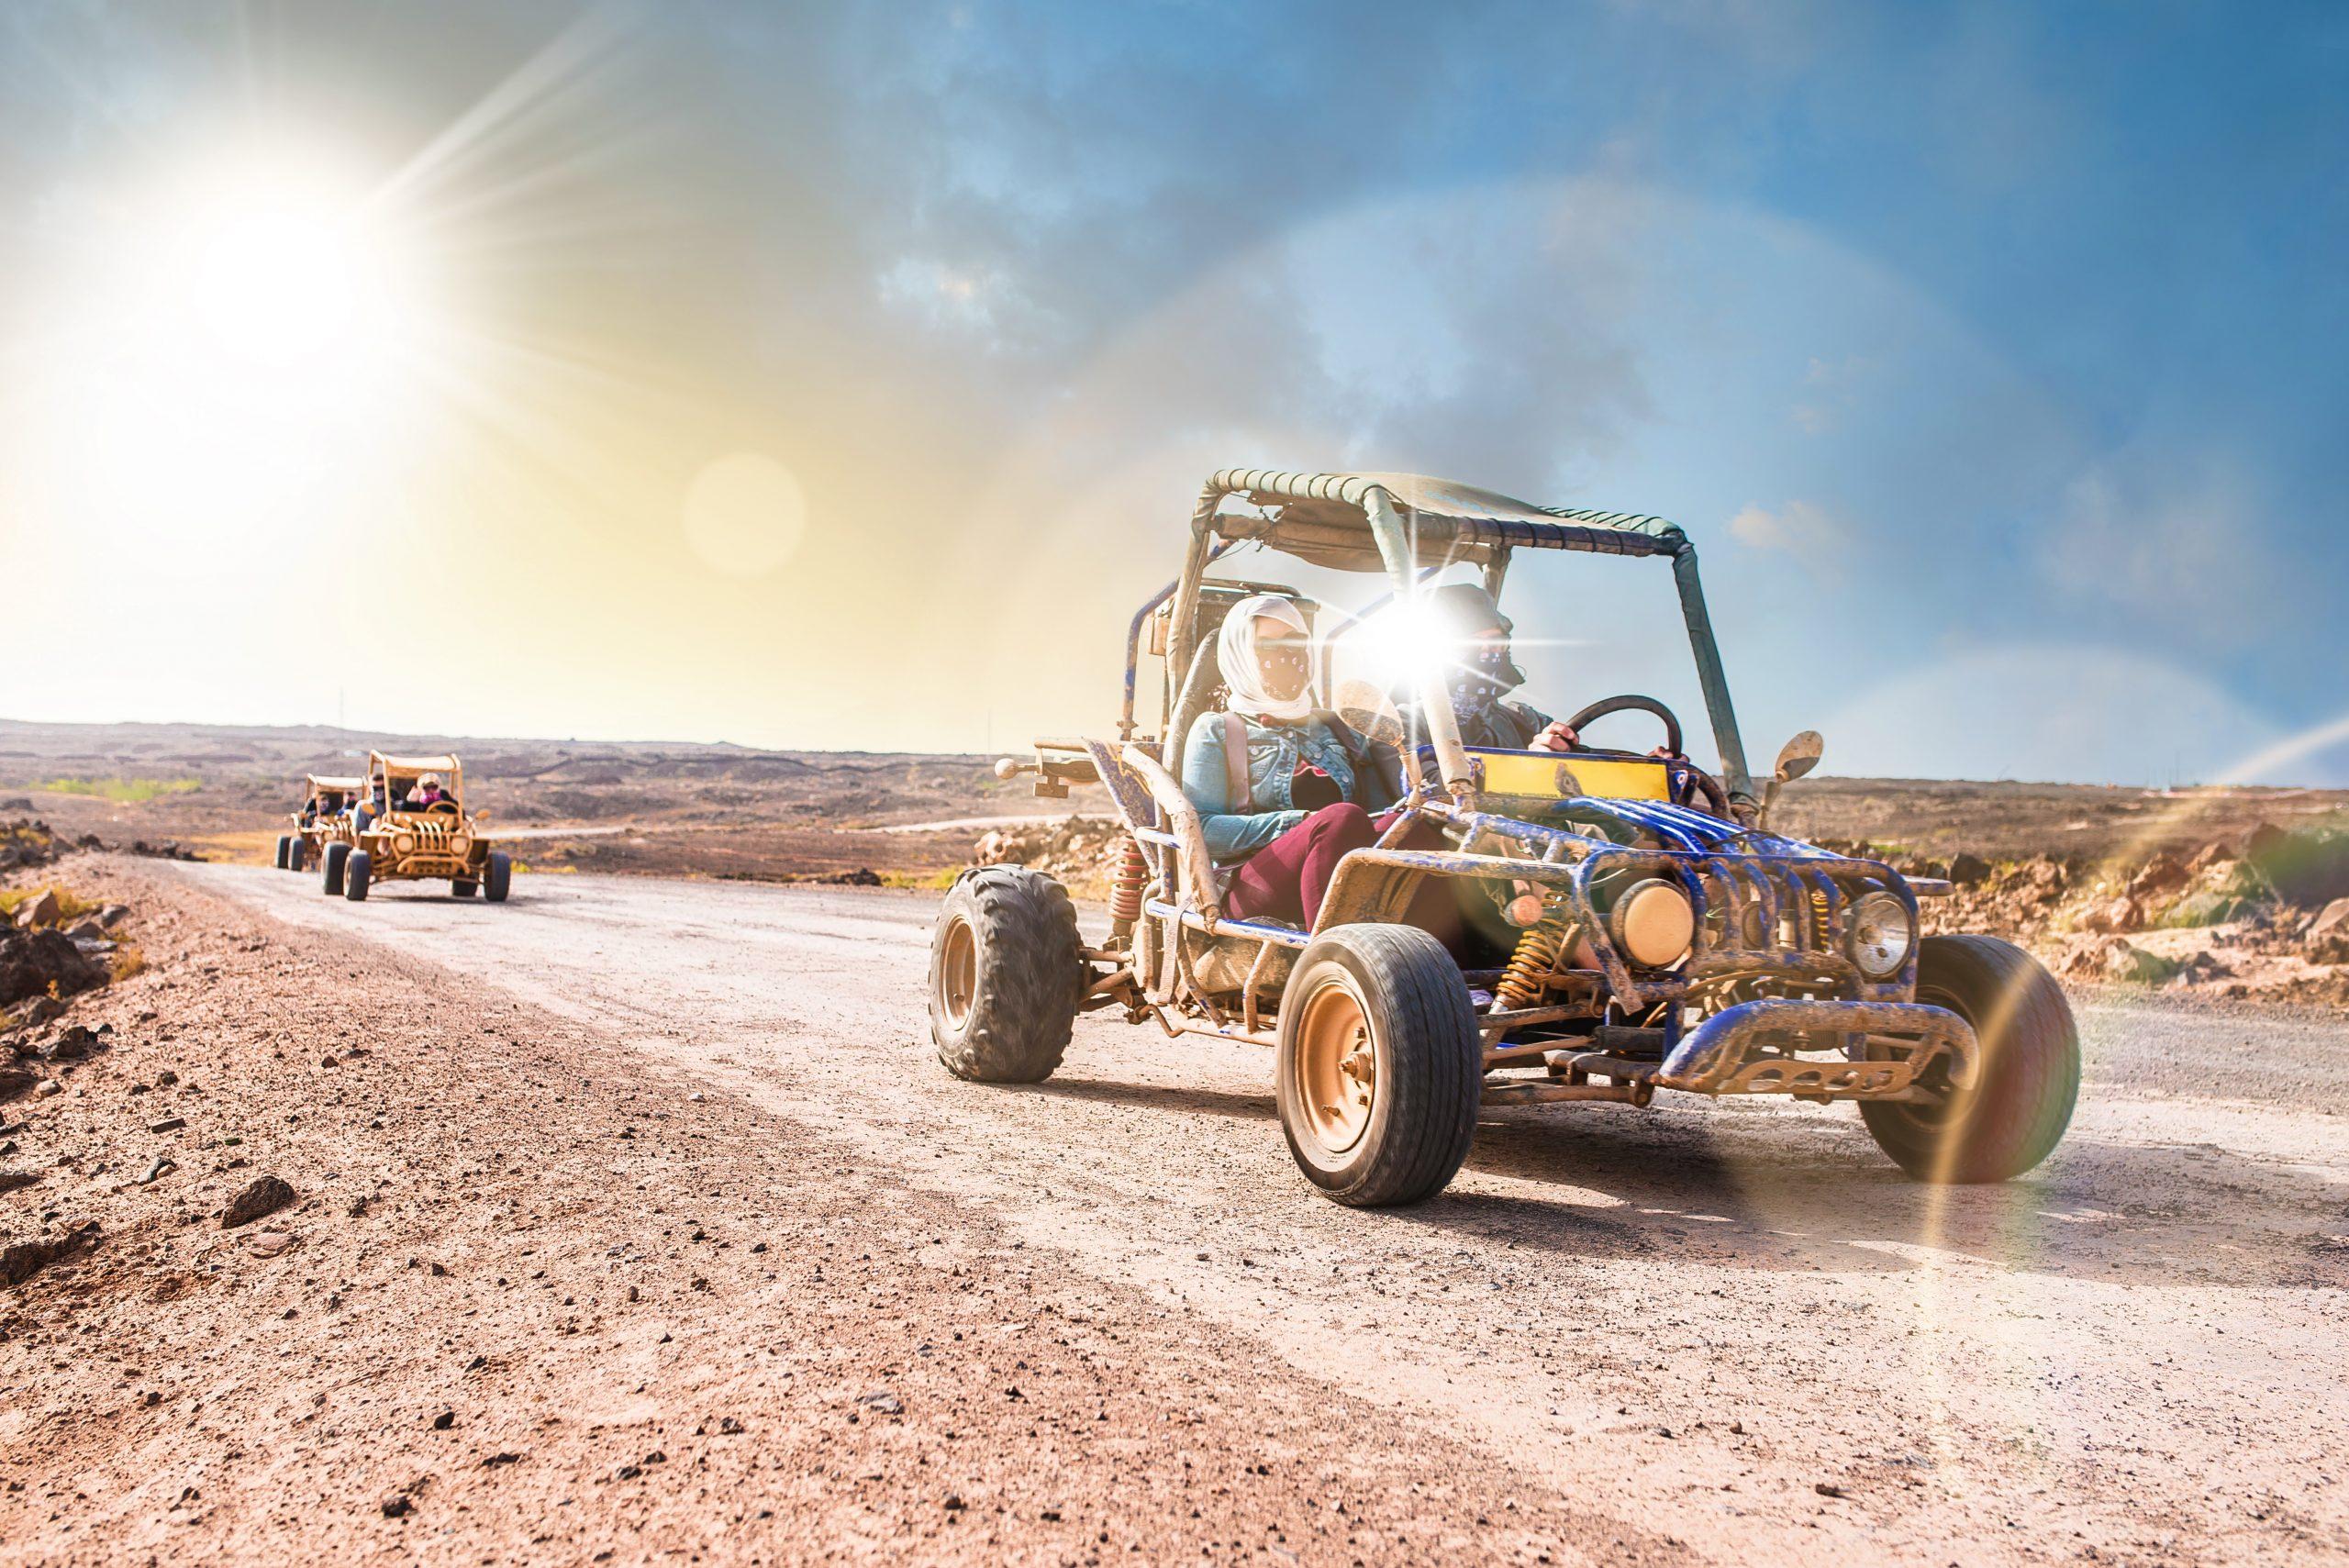 Atv Desert Buggies In The Negev